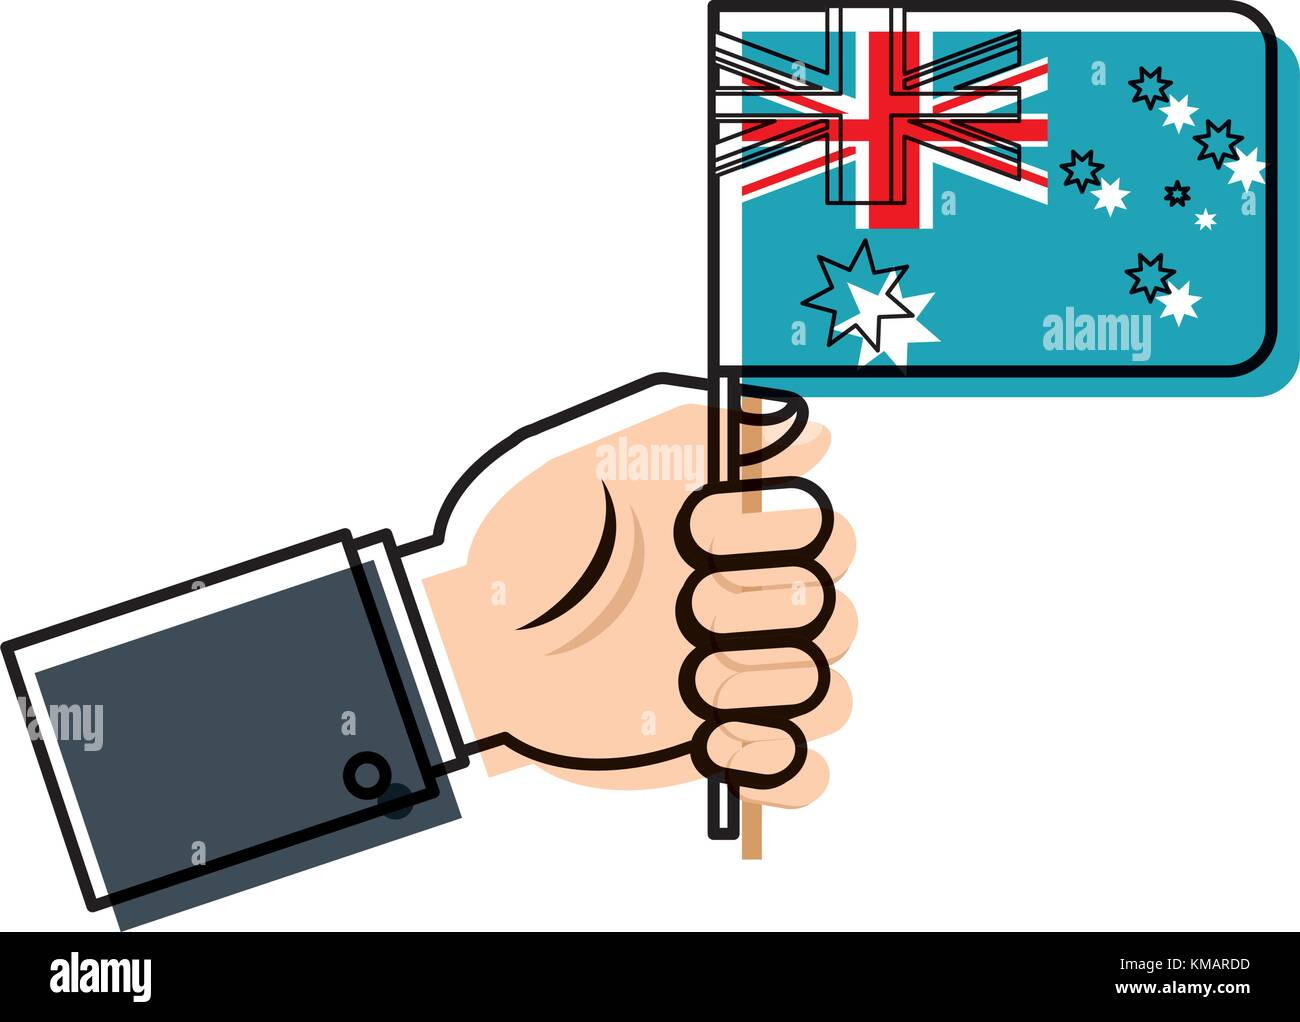 australia flag icon image - Stock Image